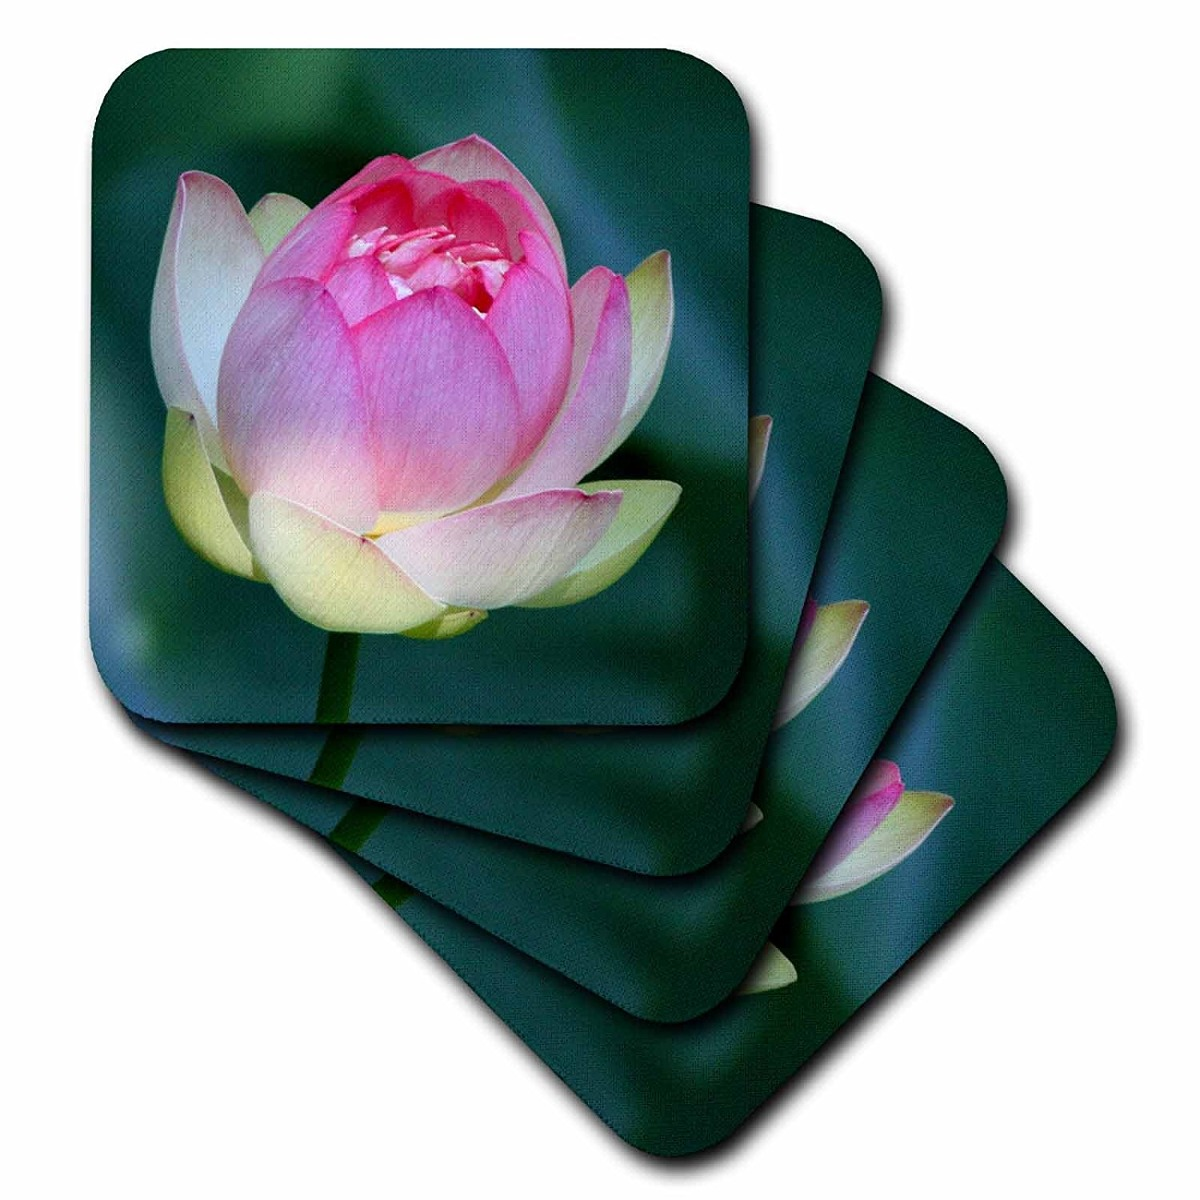 3drose a lotus flower ceramic tile coasters set of 4 cs cargando zoom izmirmasajfo